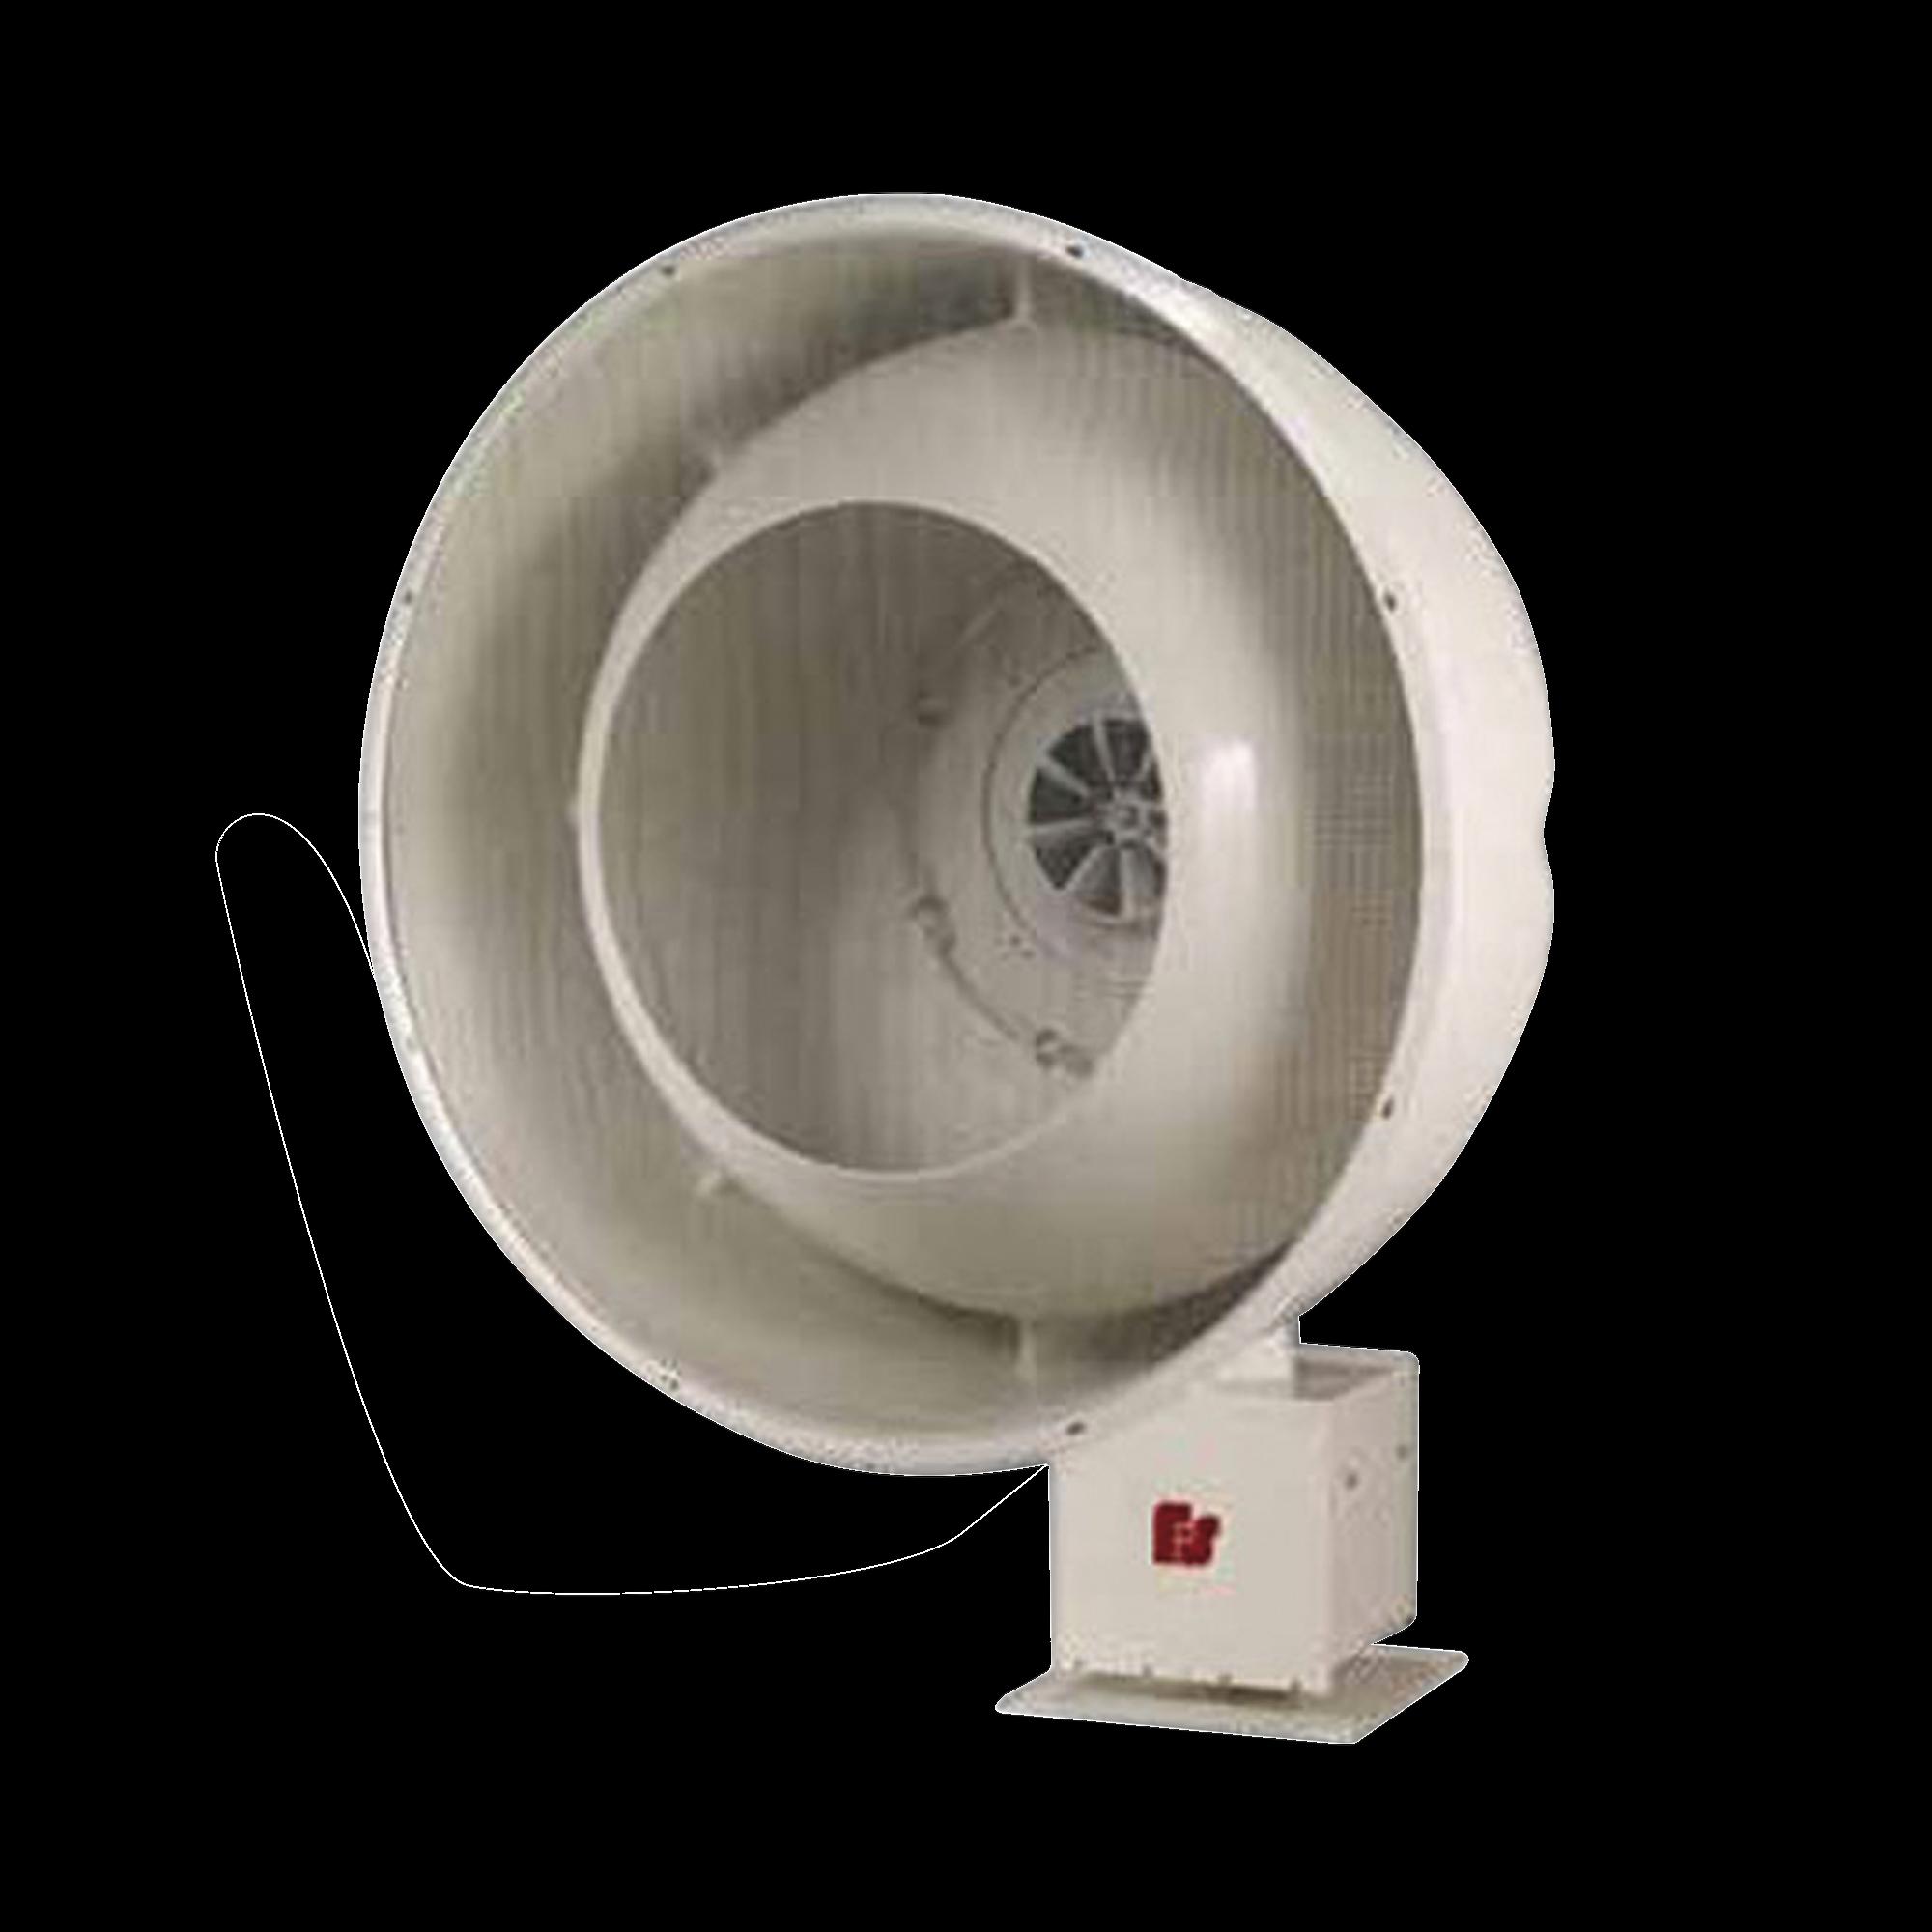 Sirena para exterior de alta potencia, 128 db(c), 500hz